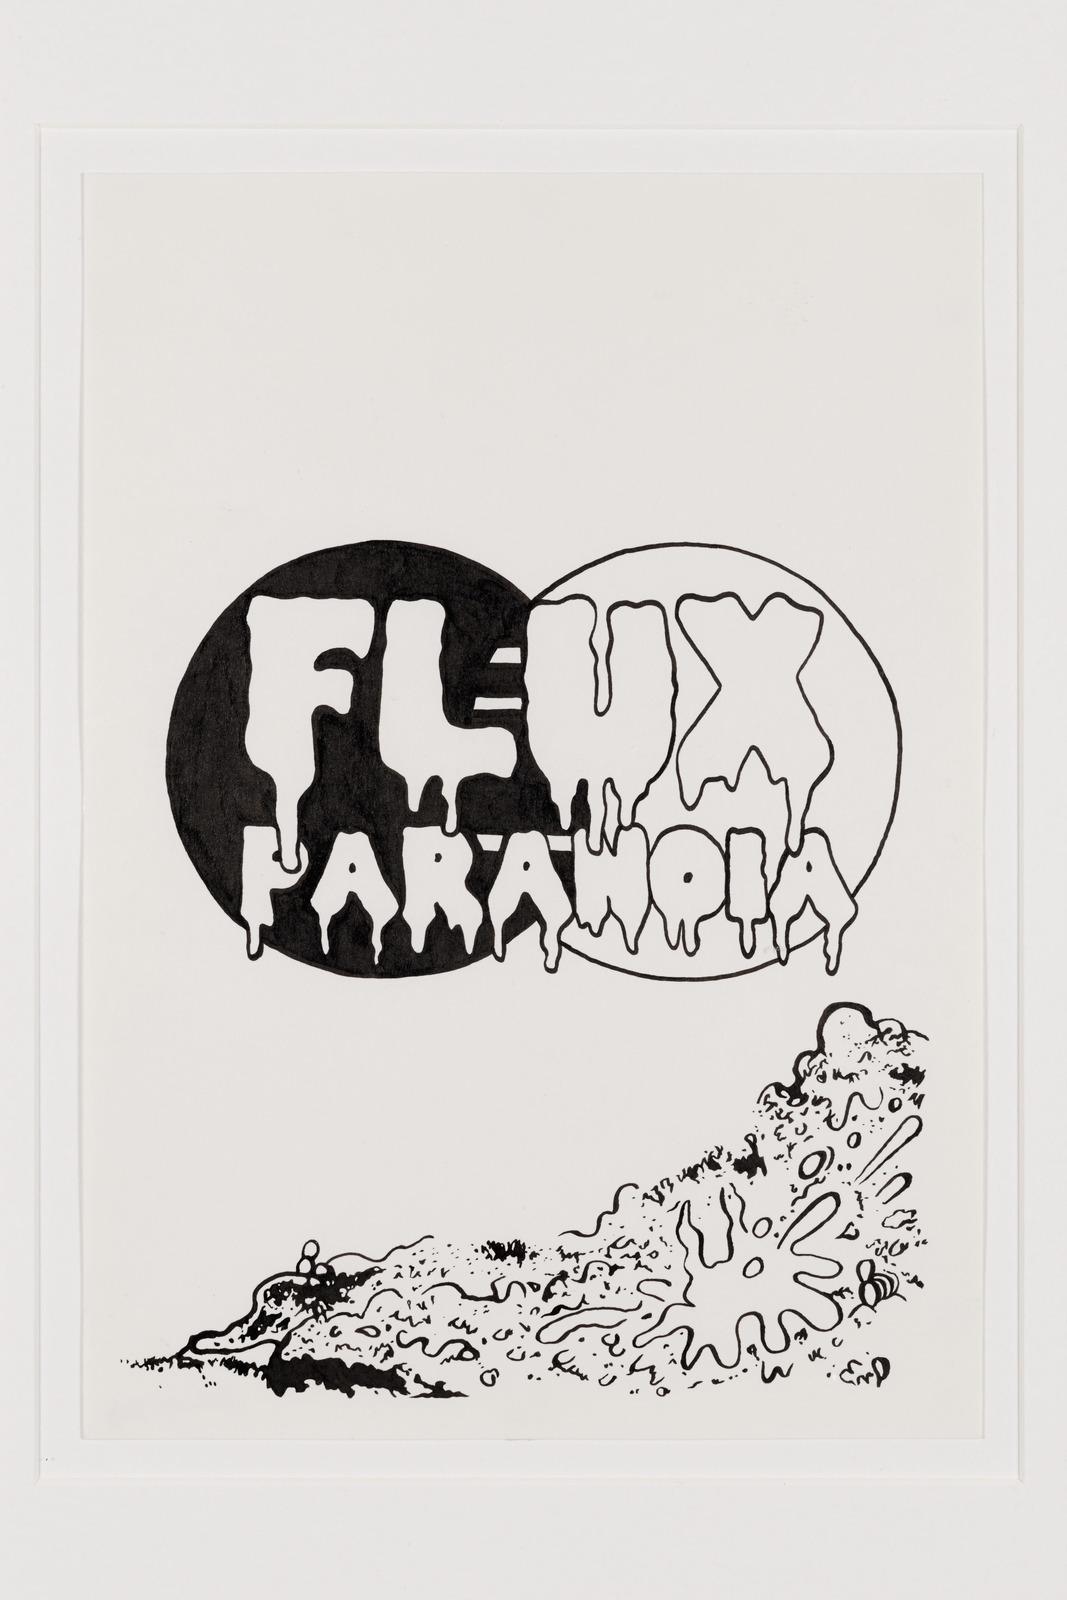 Yoan Mudry - Flux Paranoia, 2016